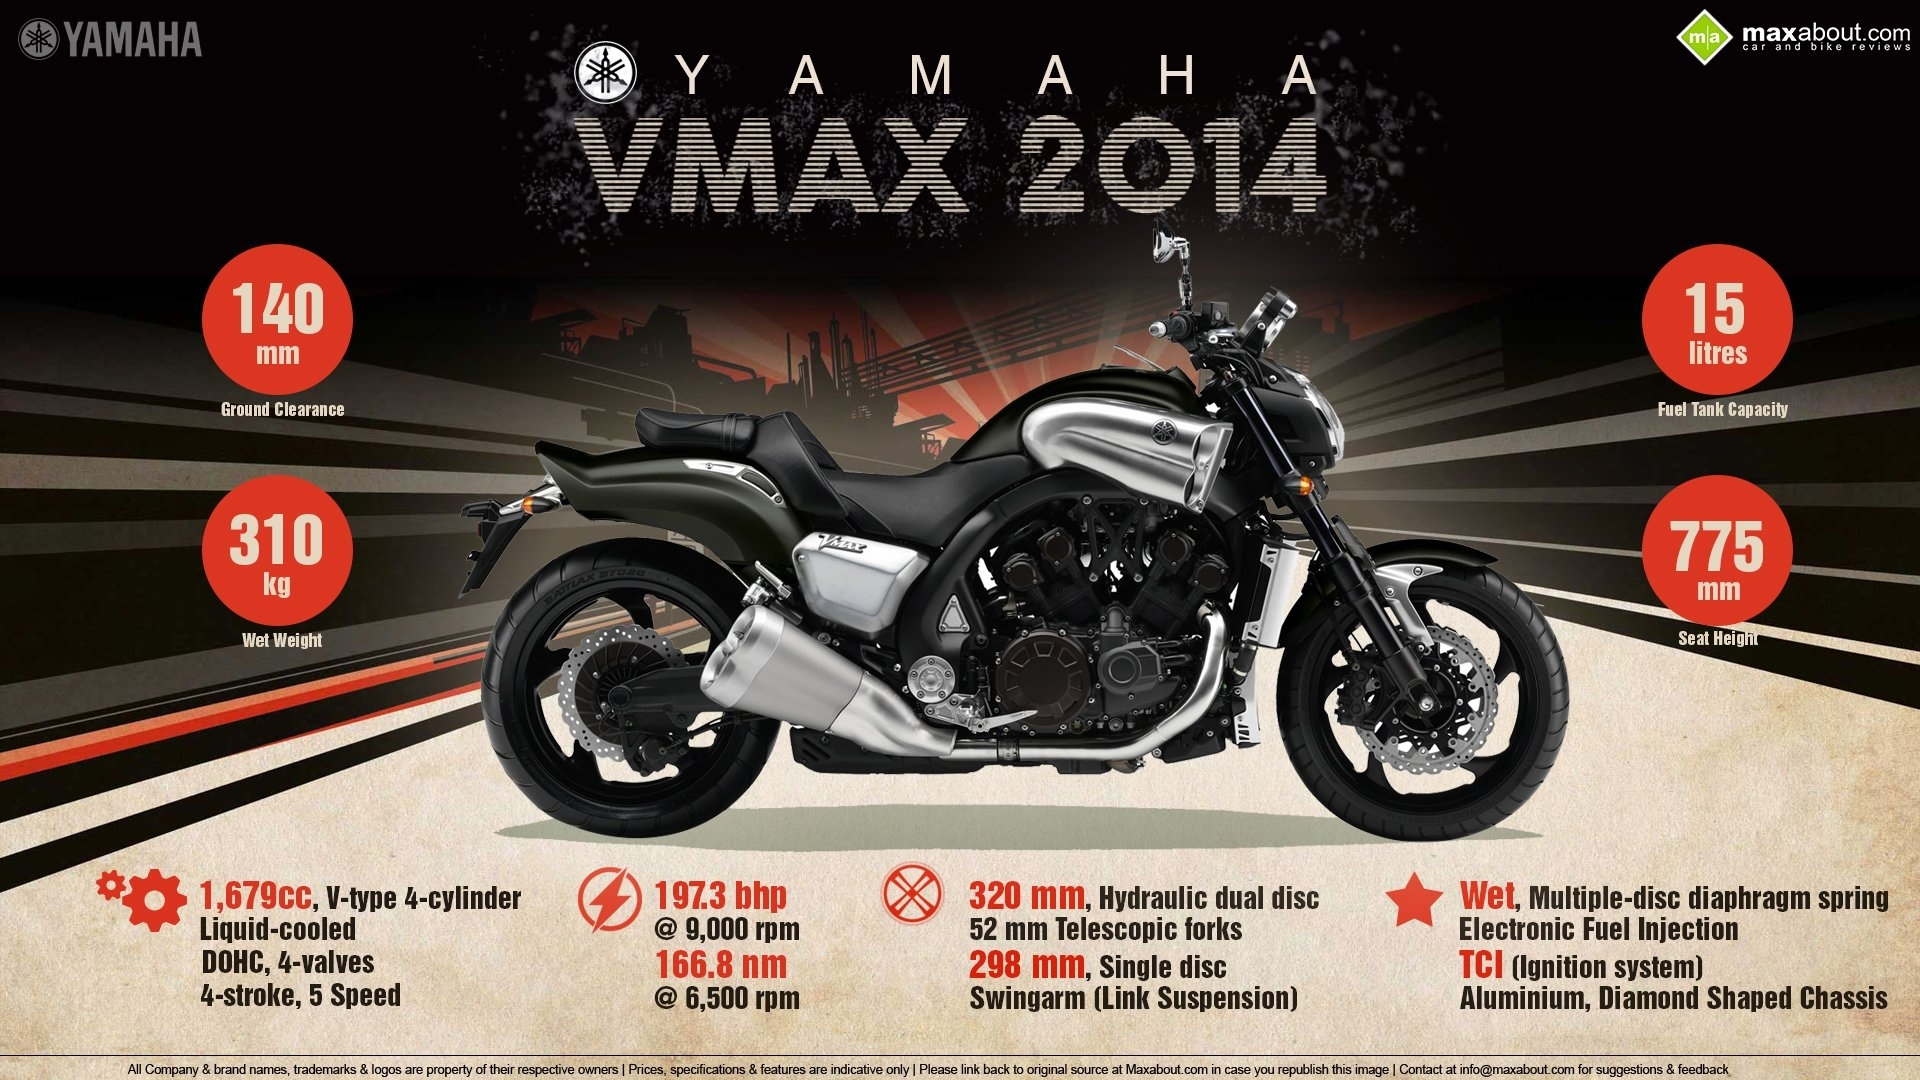 yamaha v max hd photos